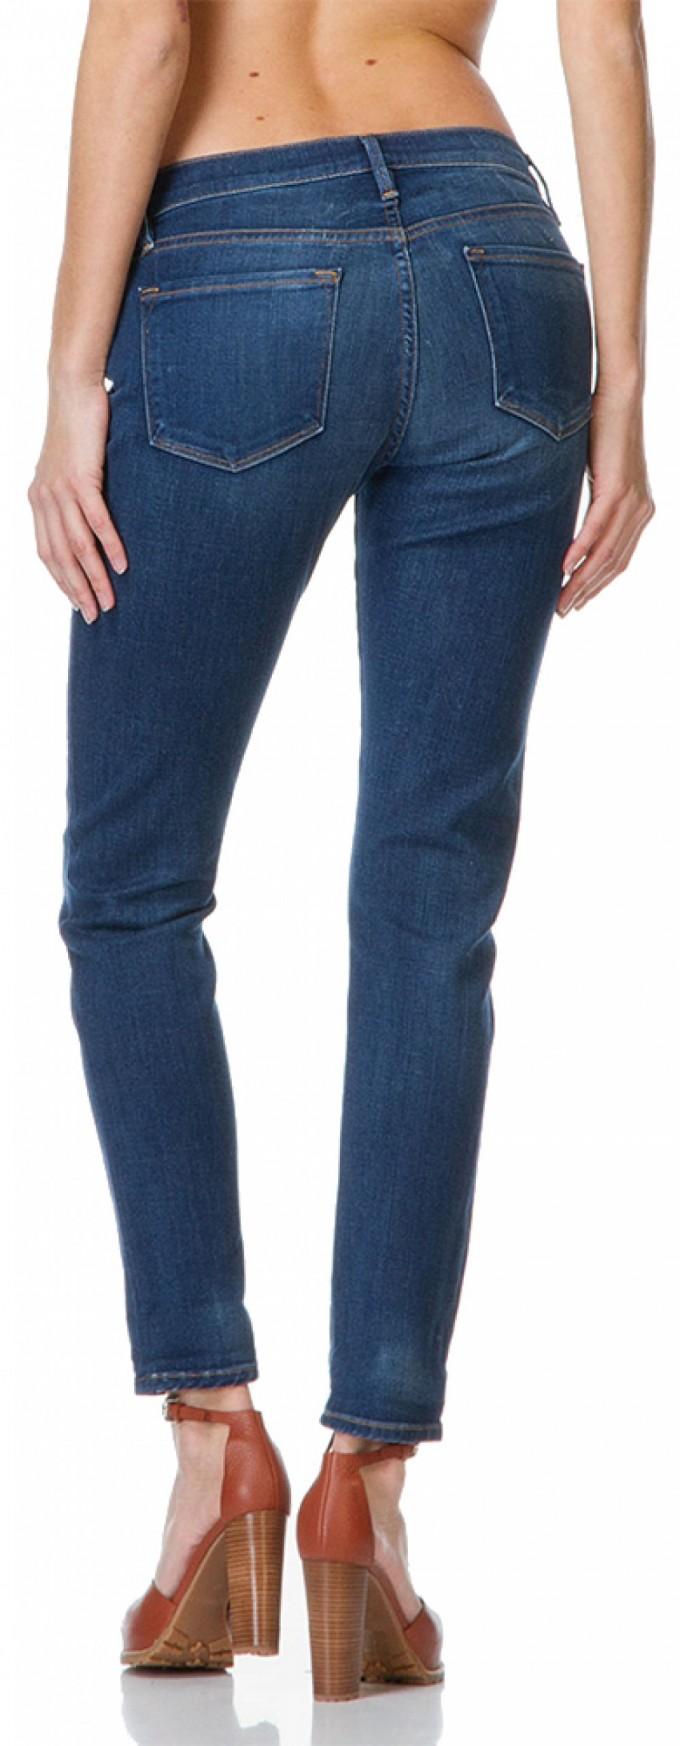 Engaging Slouchy Slim Jeans Designs | Stunning Frame Denim Le Garcon